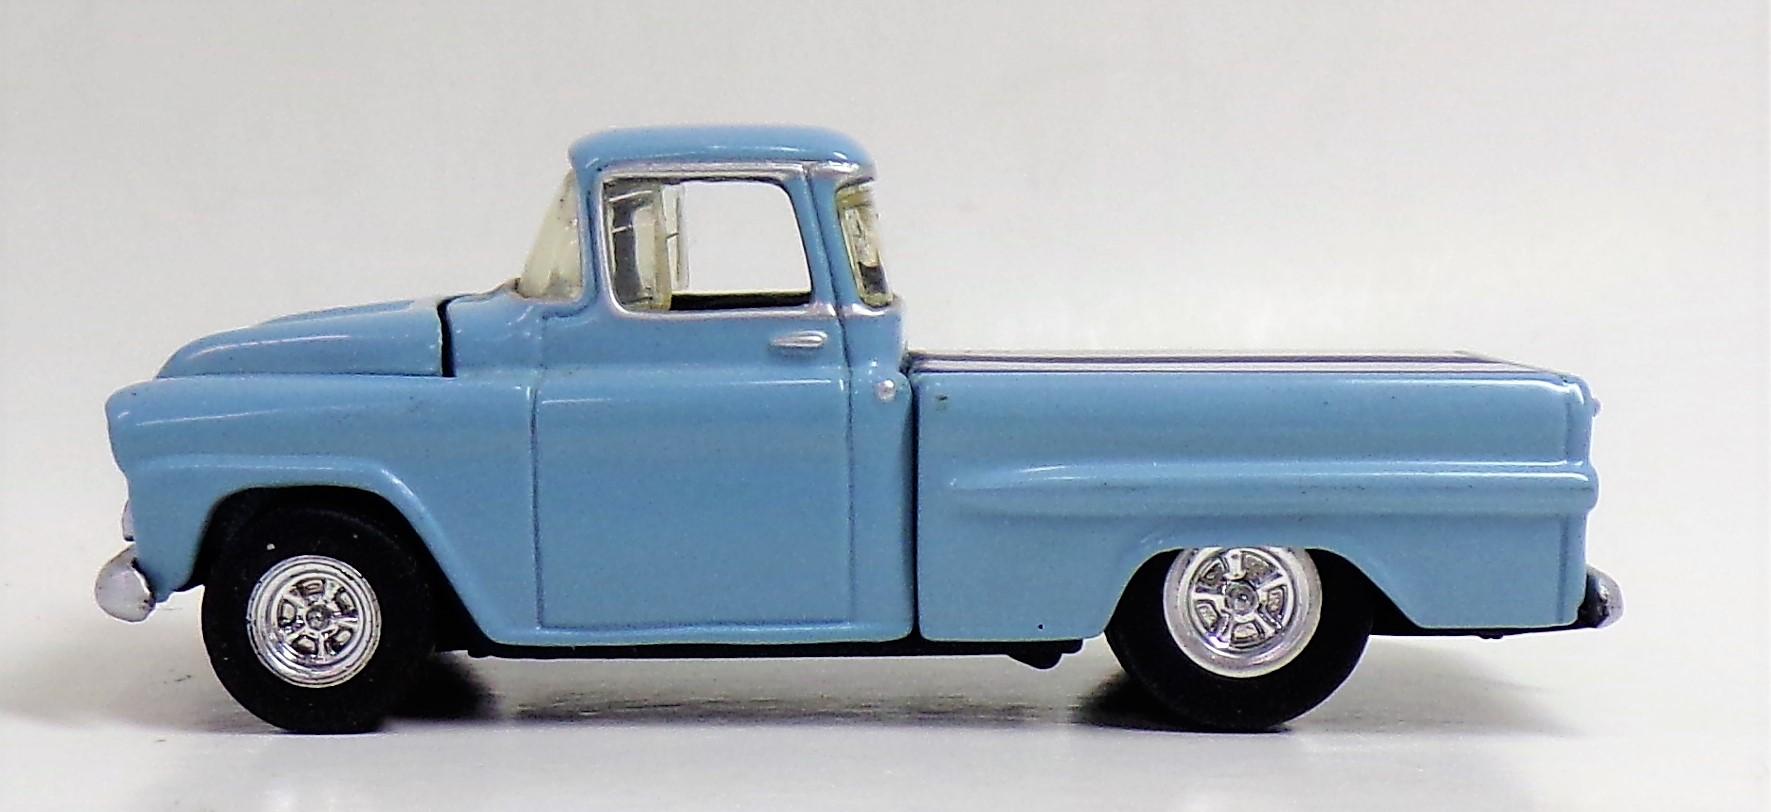 '59 Chevy Apache